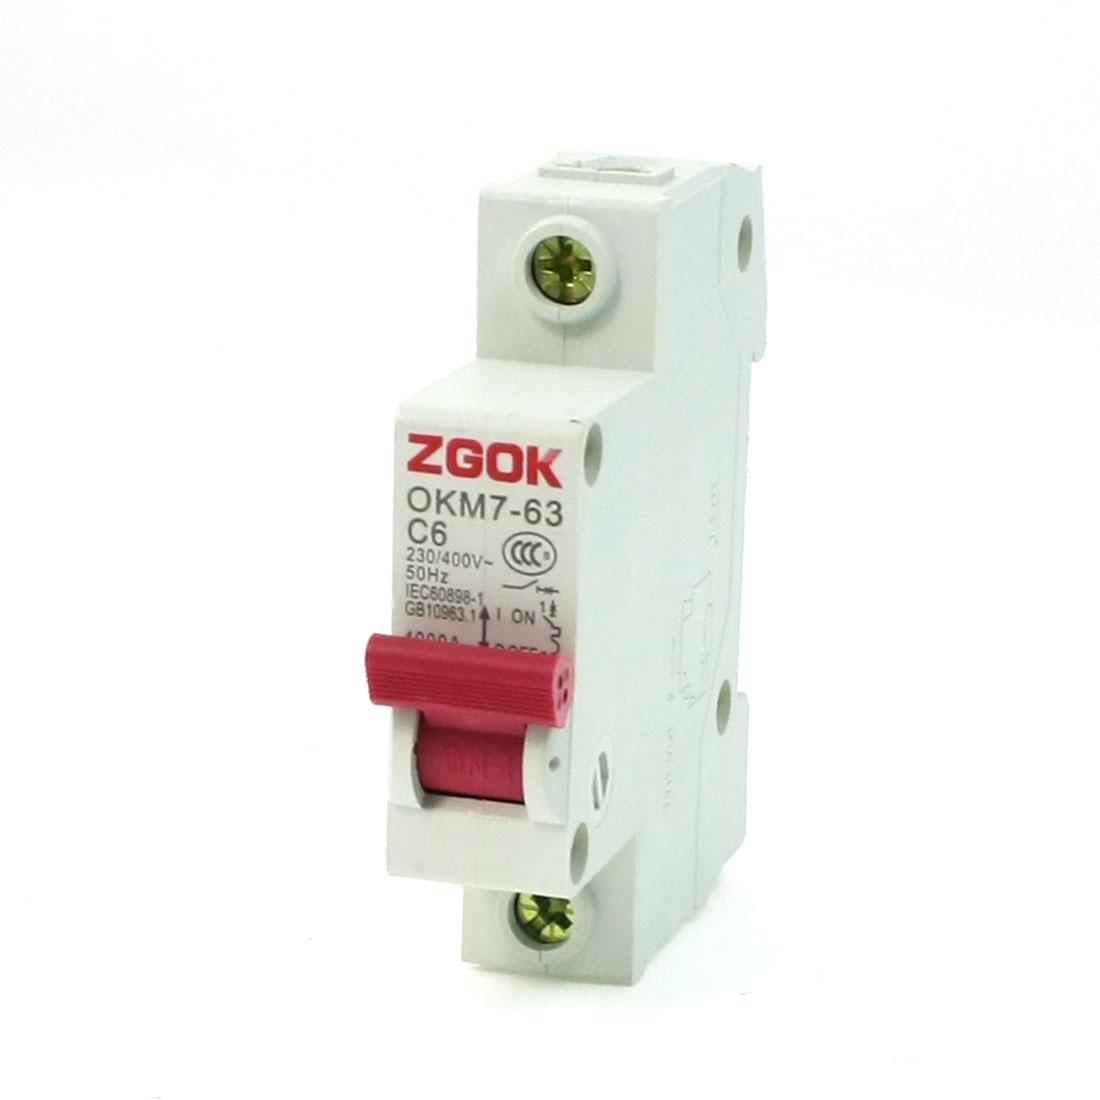 OKM7-63 C6 1 Pole MCB Miniature Circuit Breaker AC 230V 400V 6A